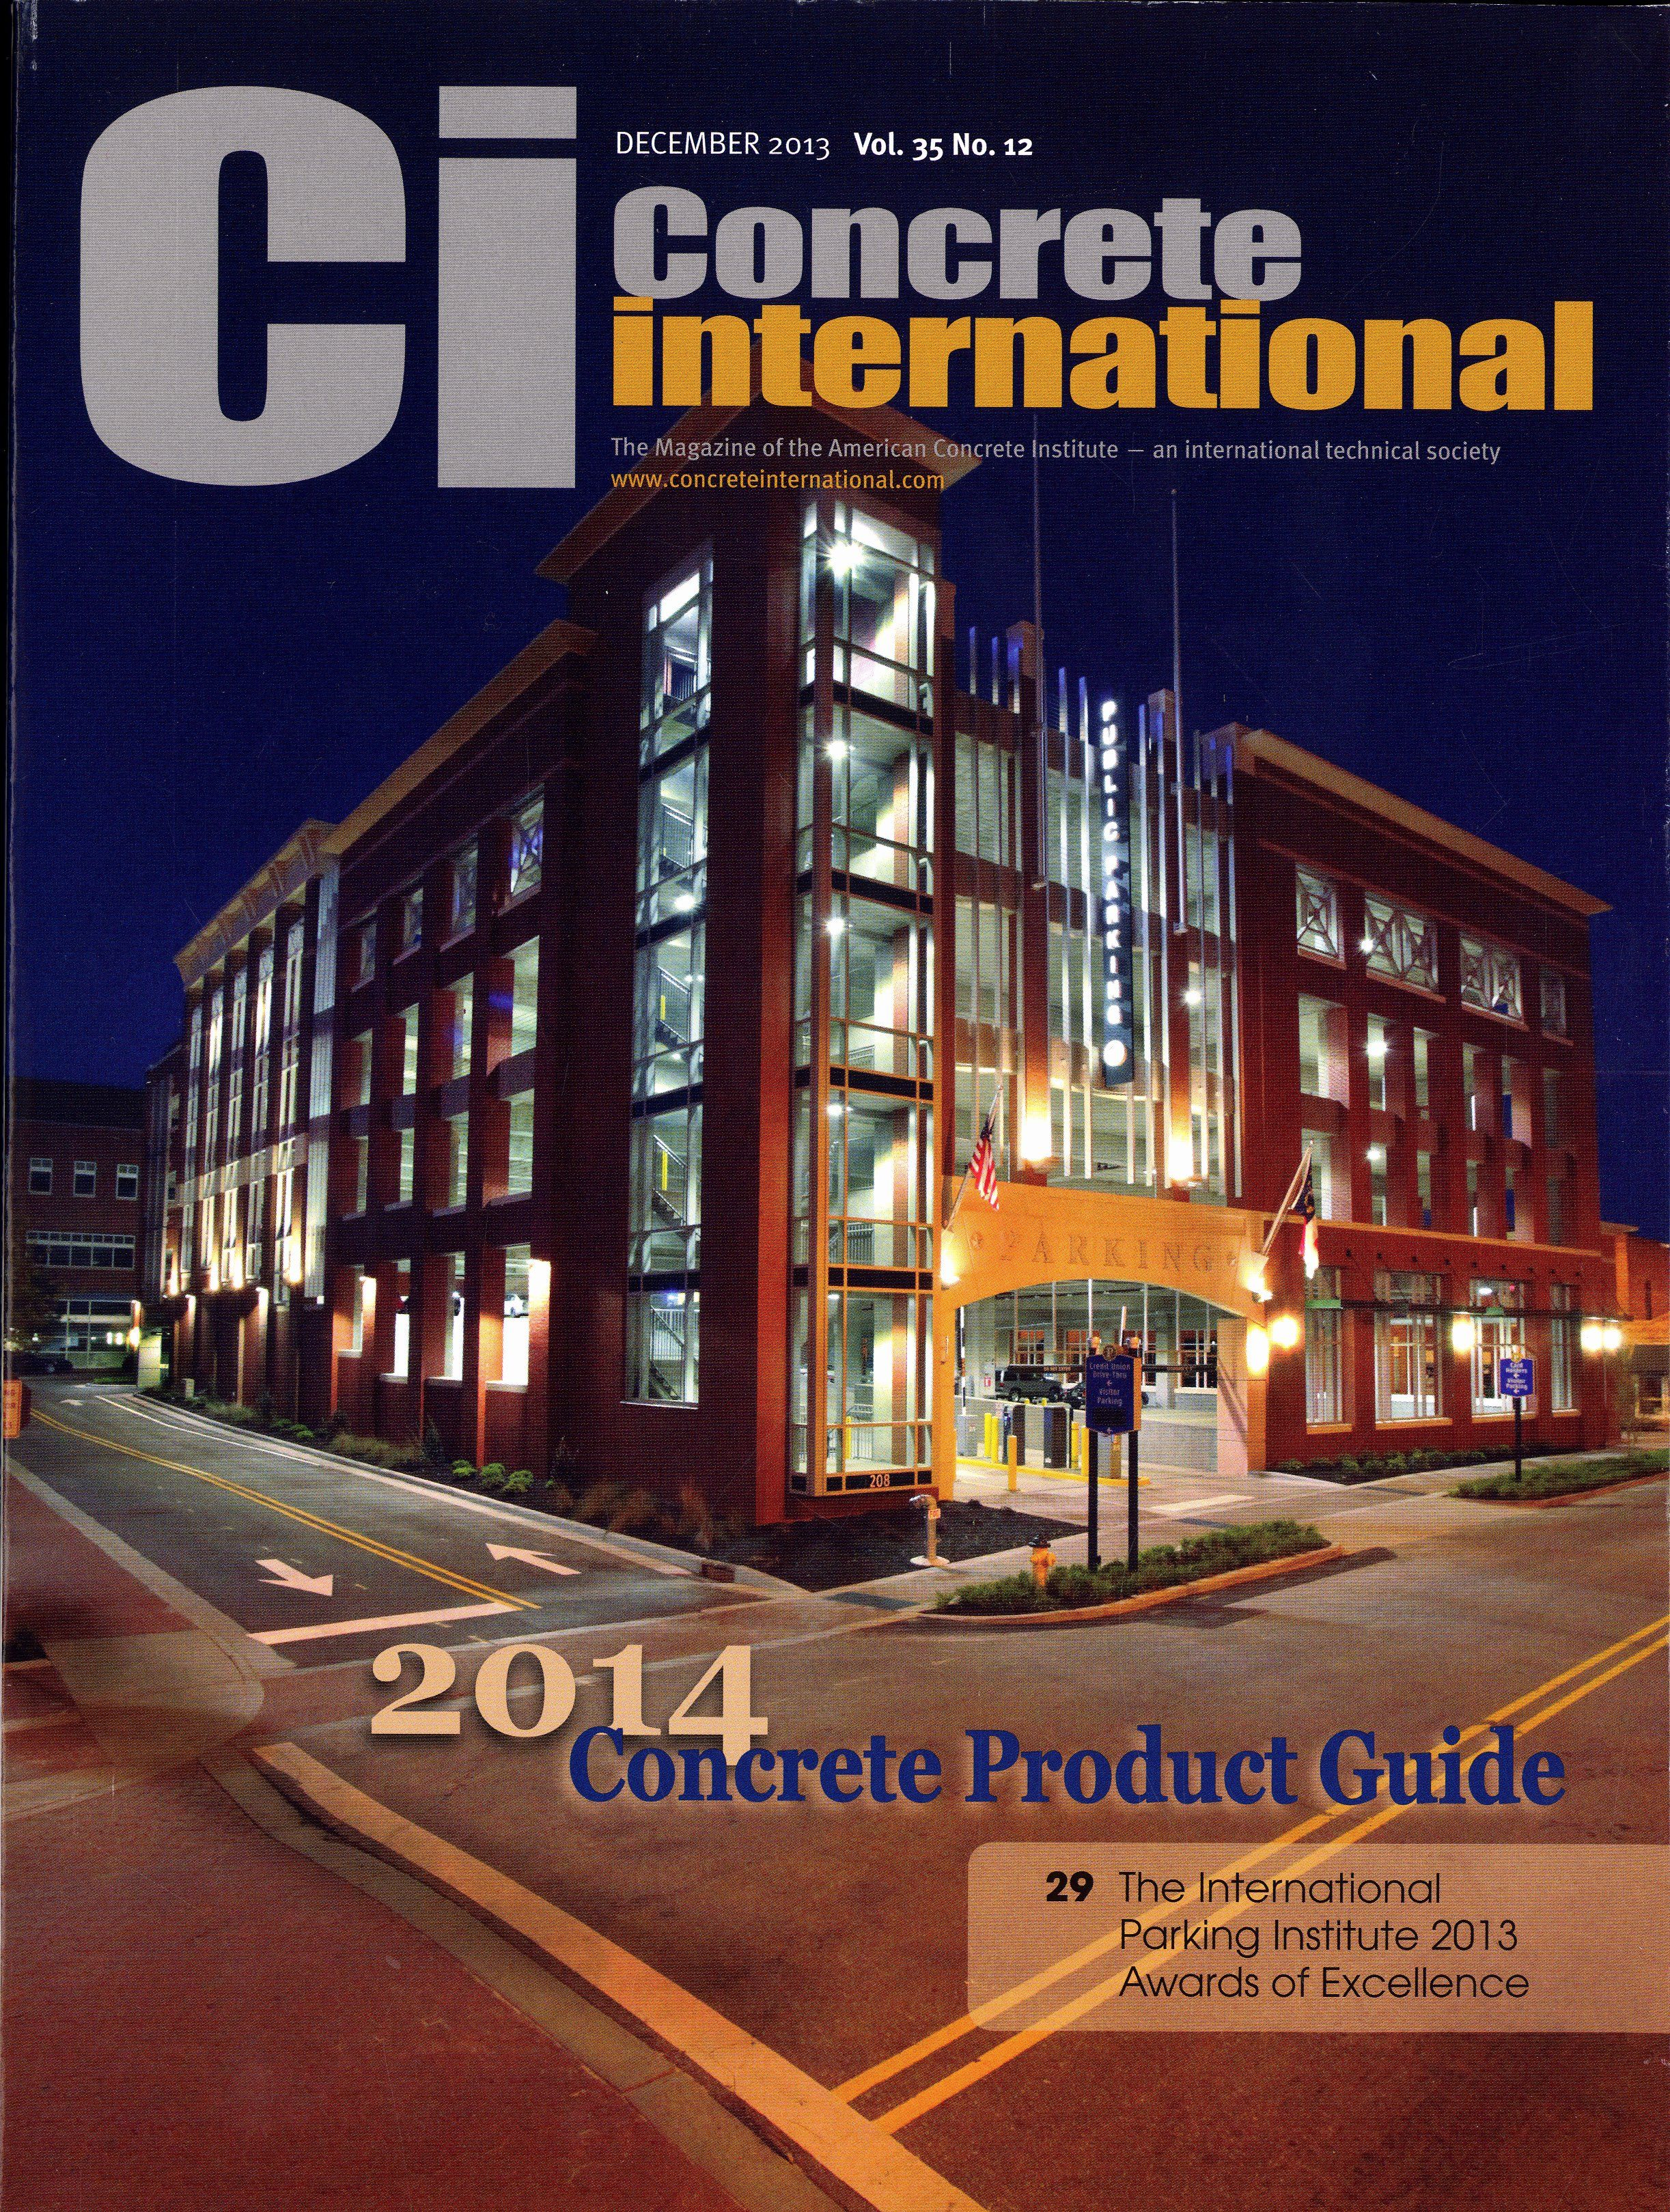 Concrete international =ISSN 0162-4075. Catálogo UPM: http://marte.biblioteca.upm.es/uhtbin/cgisirsi/x/y/0/05?searchdata1=0162-4075{022} ProQuest: http://search.proquest.com/publication/29749 Web revista: http://www.concreteinternational.com/pages/index.asp